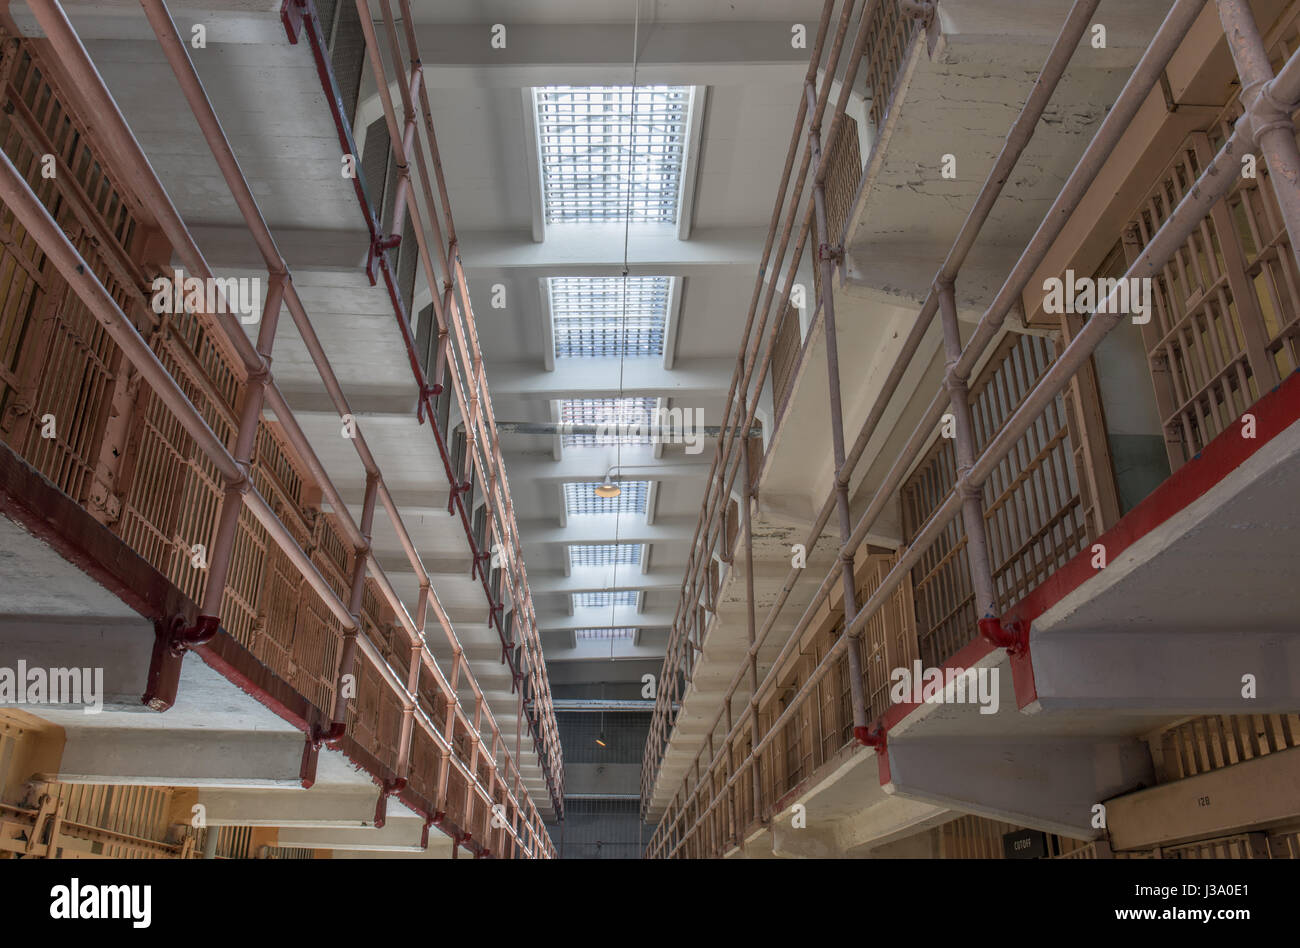 San Francisco, California, United States - April 30, 2017: Cell Block of Alcatraz Prison. - Stock Image